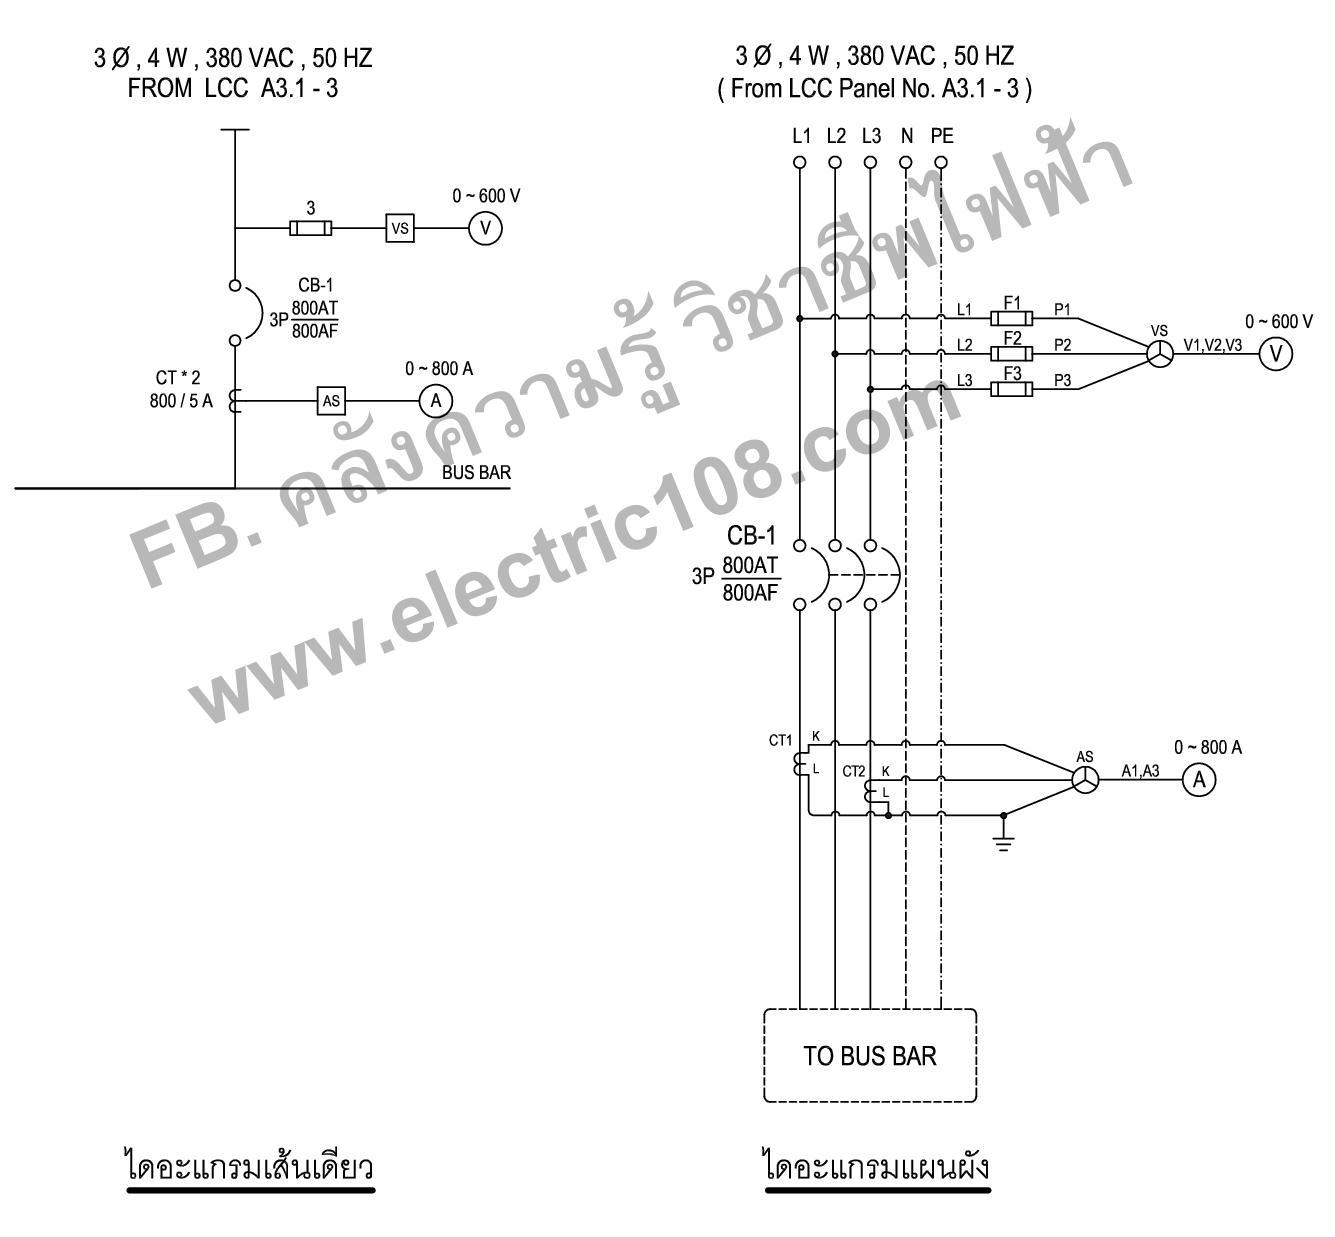 380v Single Line Wiring Diagram Detailed Schematics Tie Inverter Schematic Get Free Image About One Standard Electrical